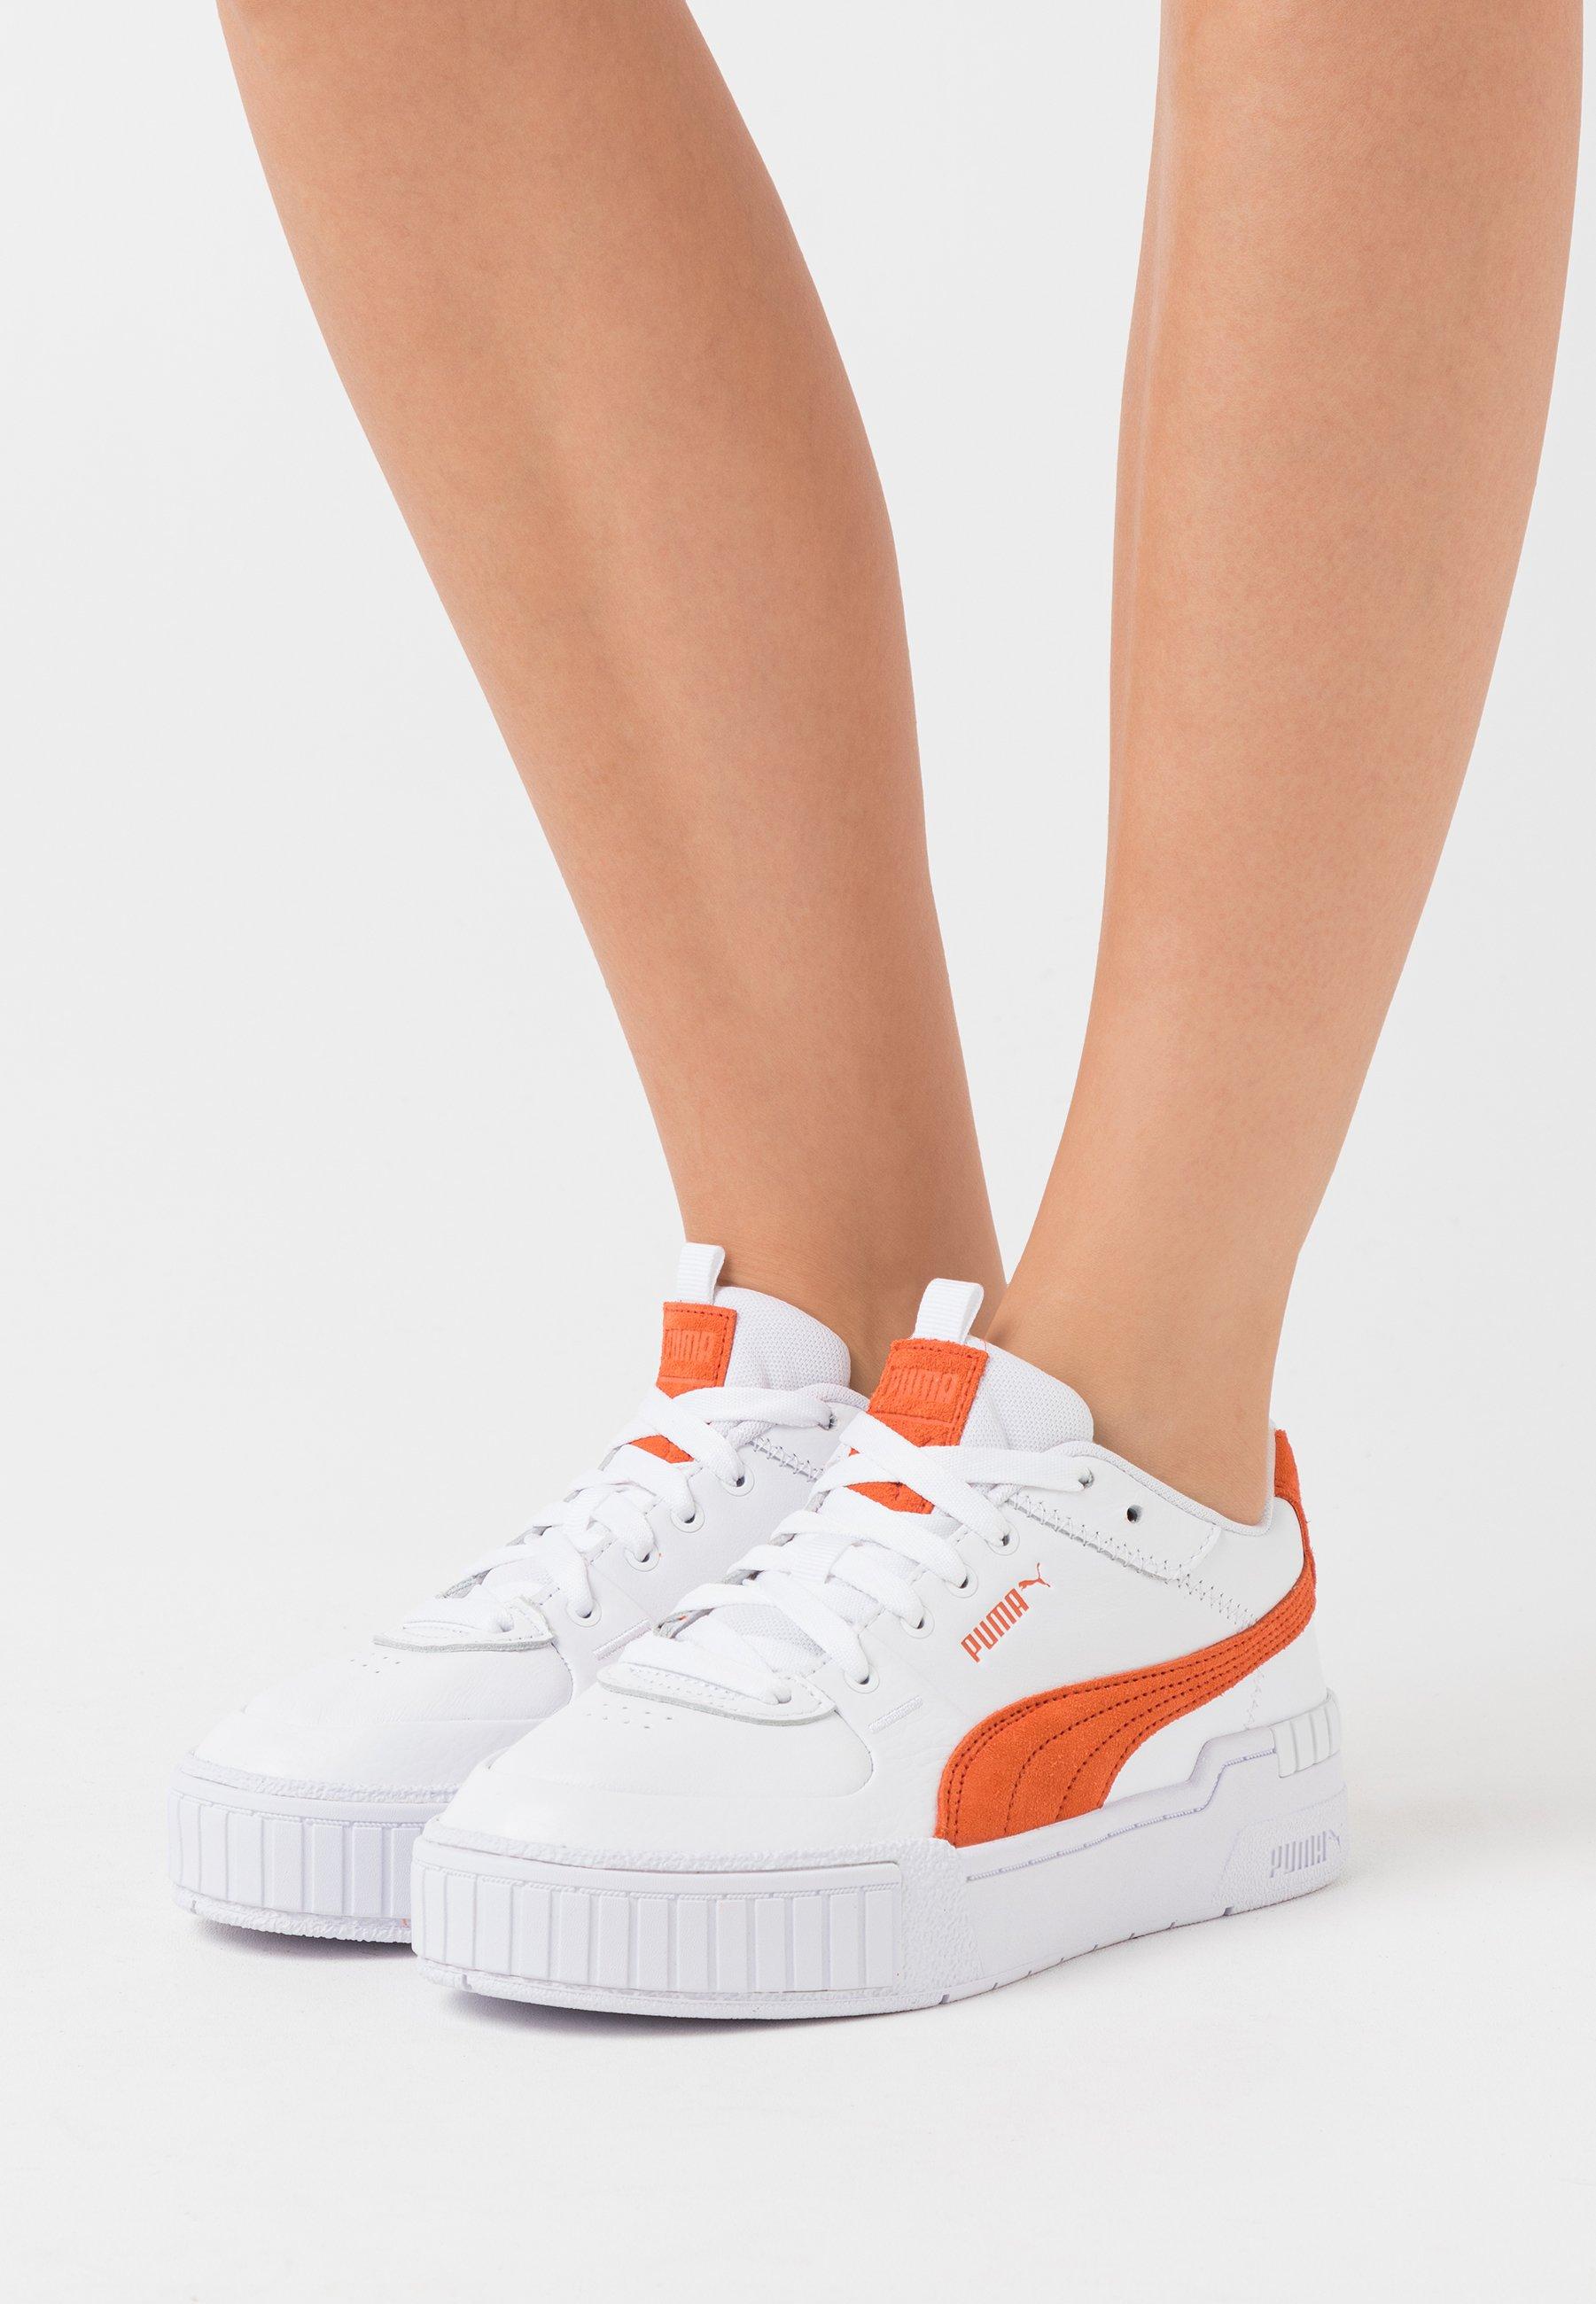 Puma CALI SPORT - Baskets basses - white/ultra orange/orange ...